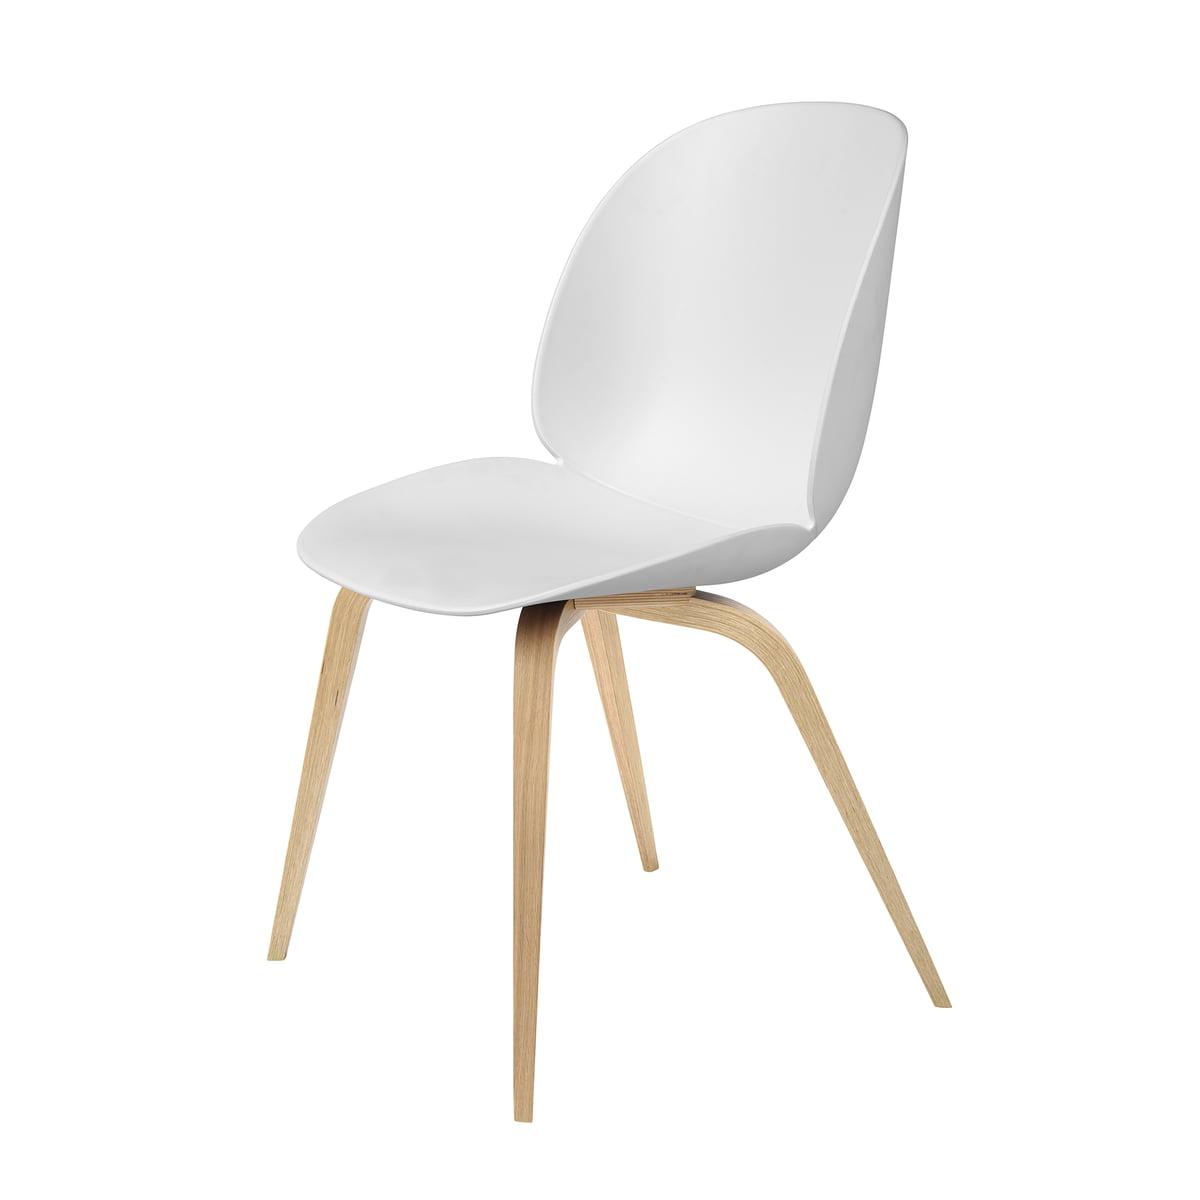 Gubi - Beetle Dining Chair, Wood Base, oak / white